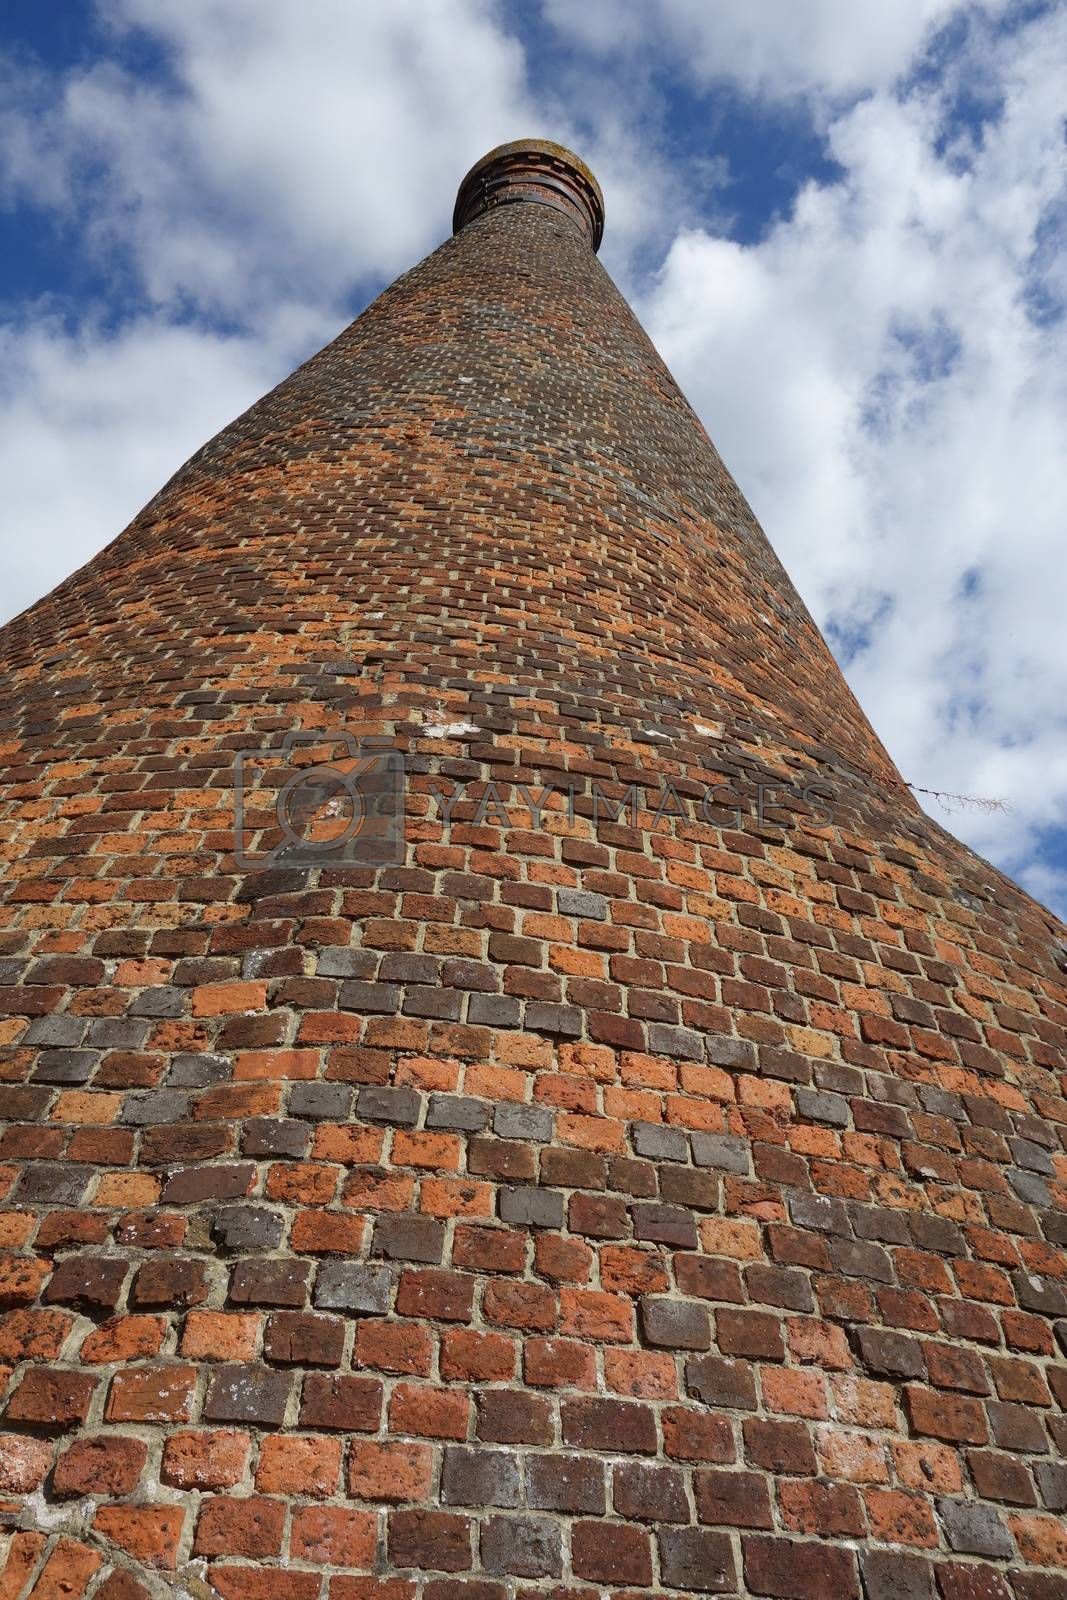 Old Brick Kiln by James53145